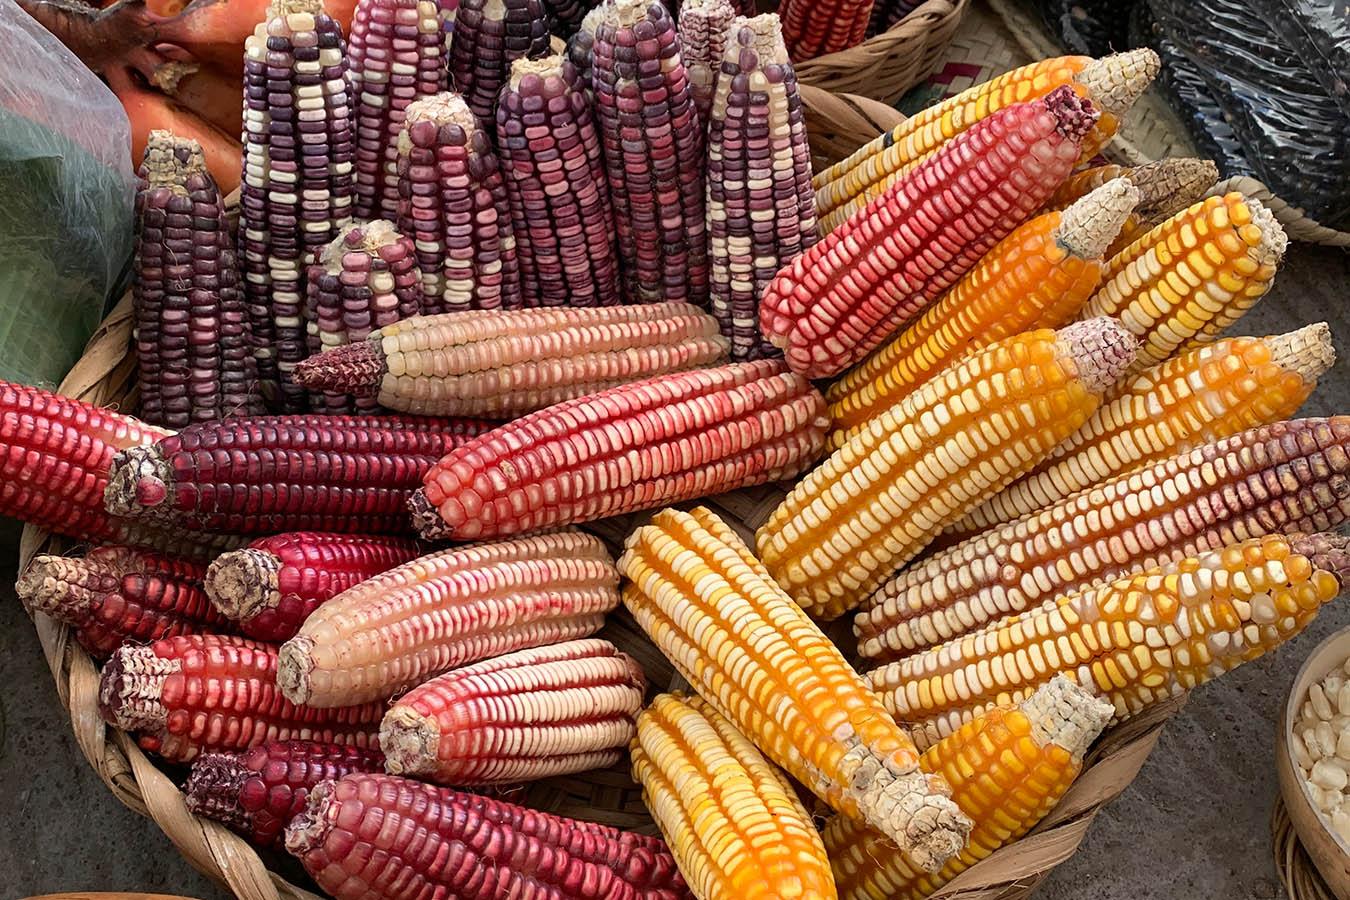 tipos de maiz maiz criollo maiz mexicano semillas de maiz tipos de granos de maiz